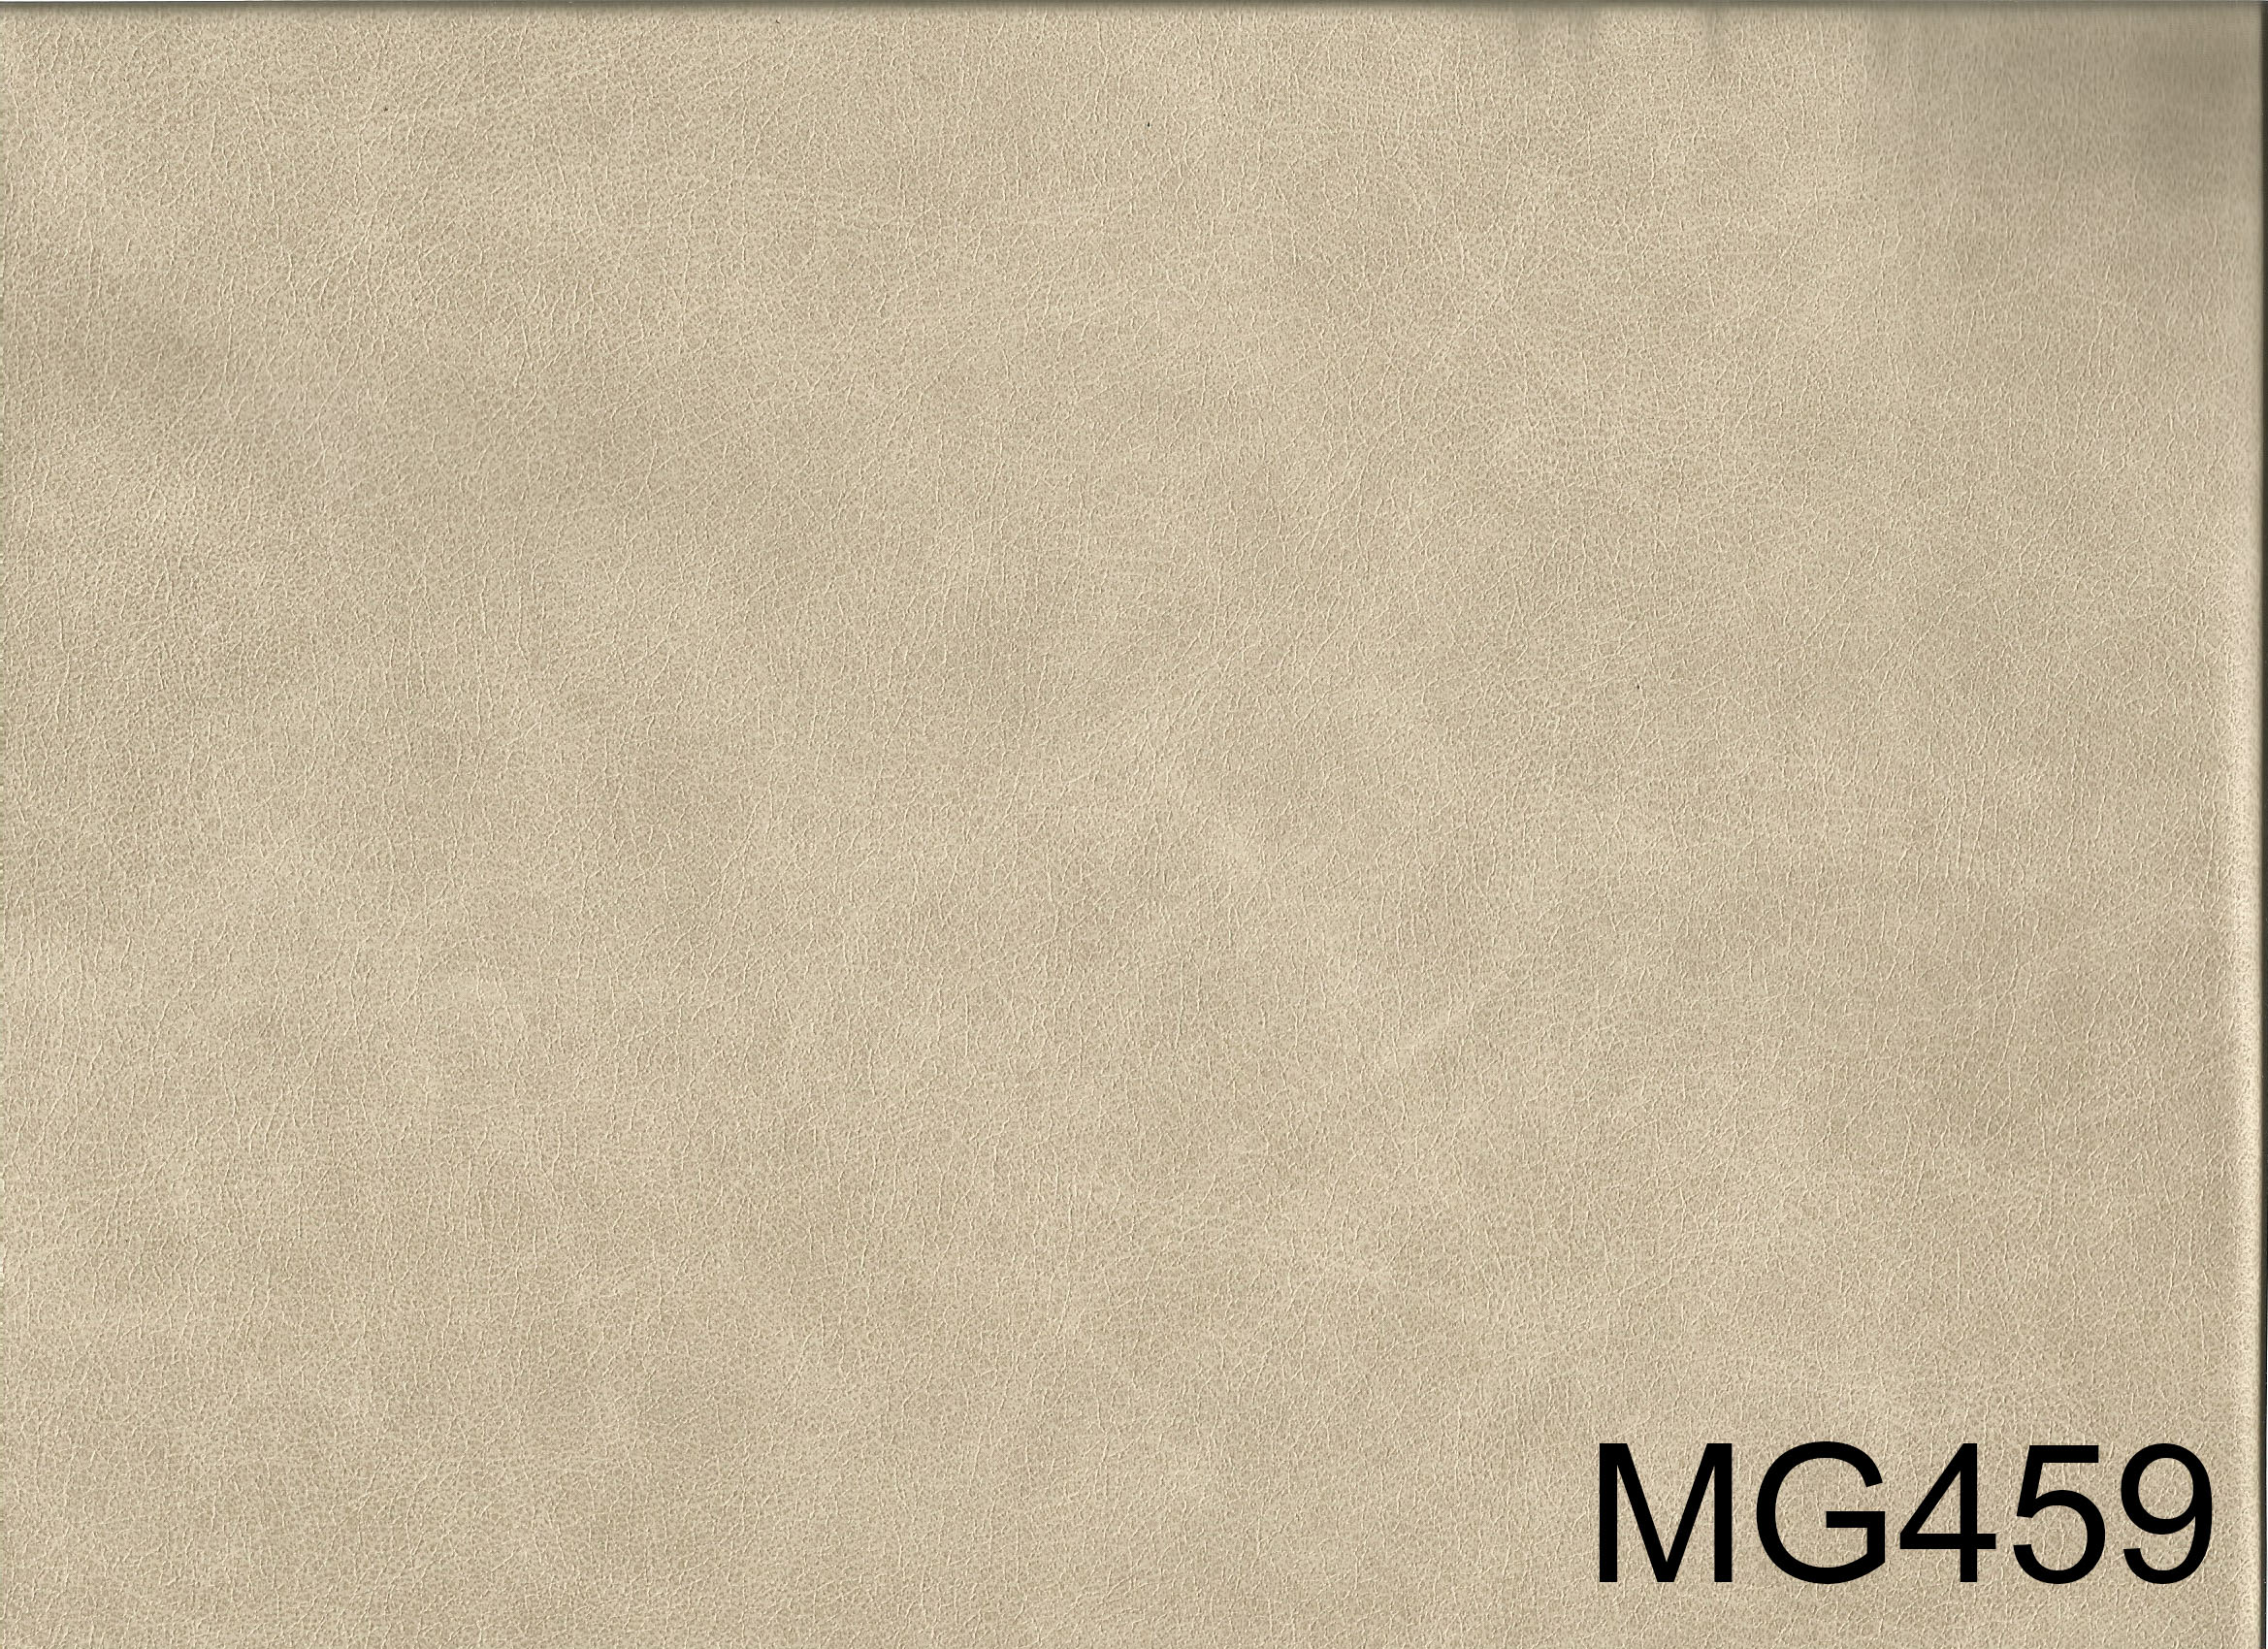 MG459